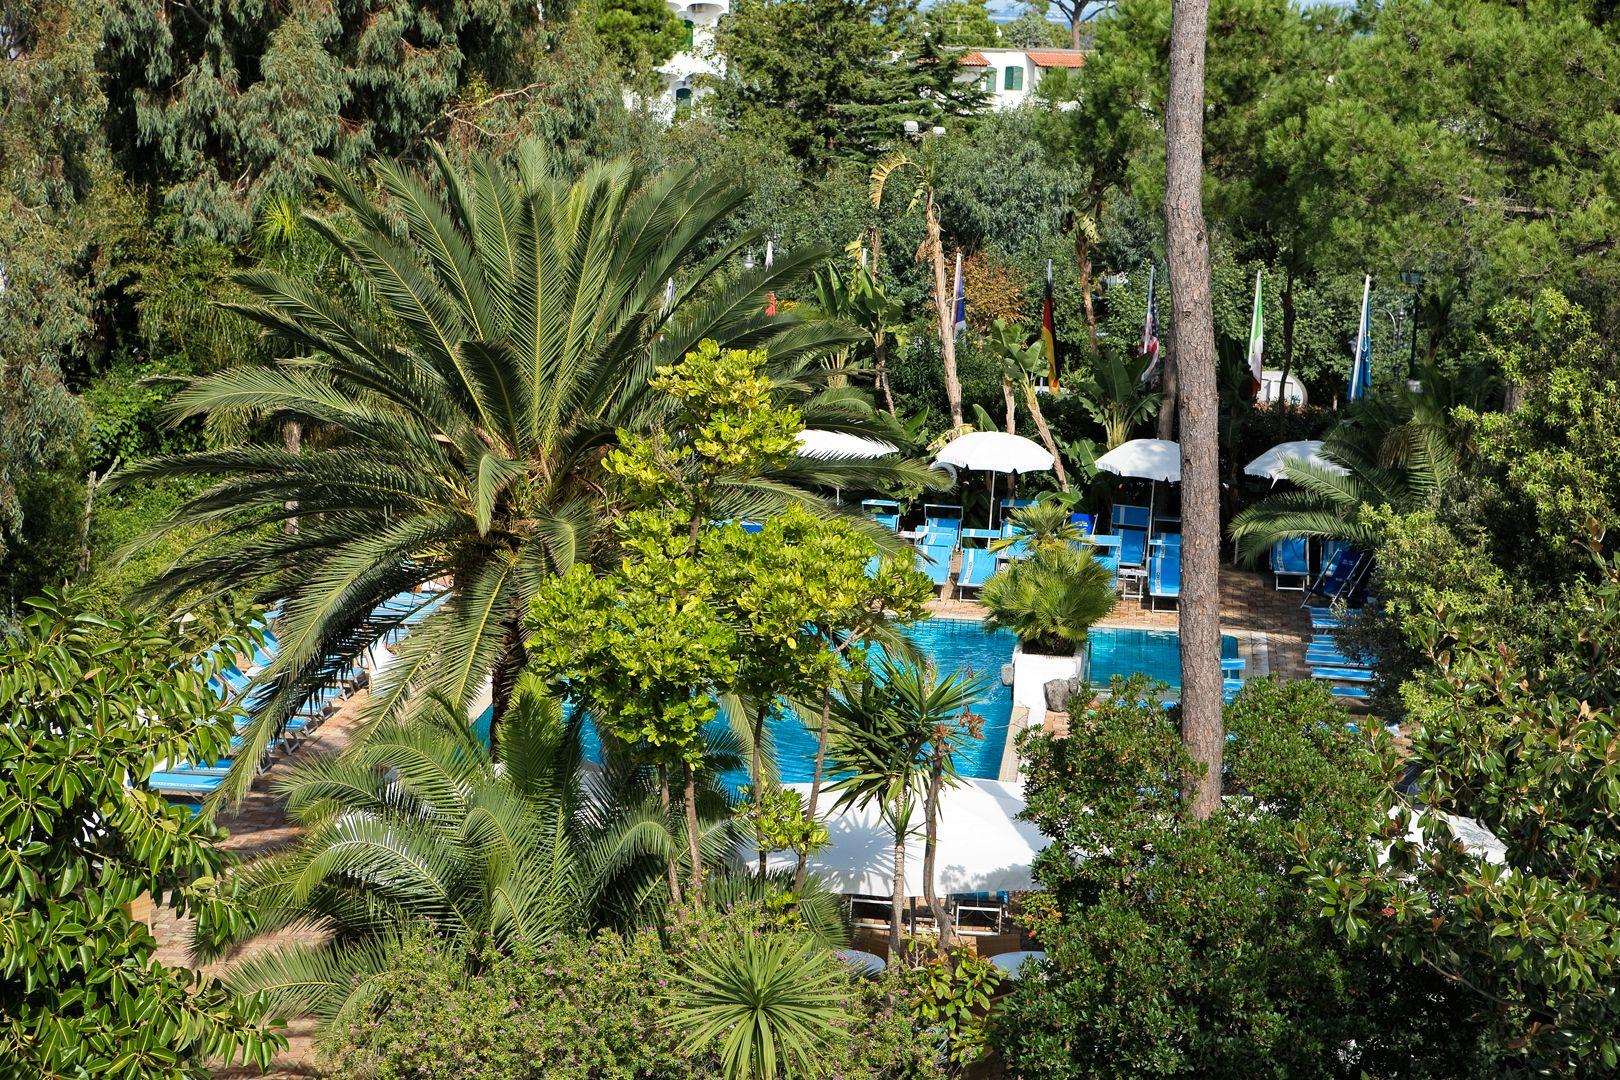 Hotel-central-park-ischia-15